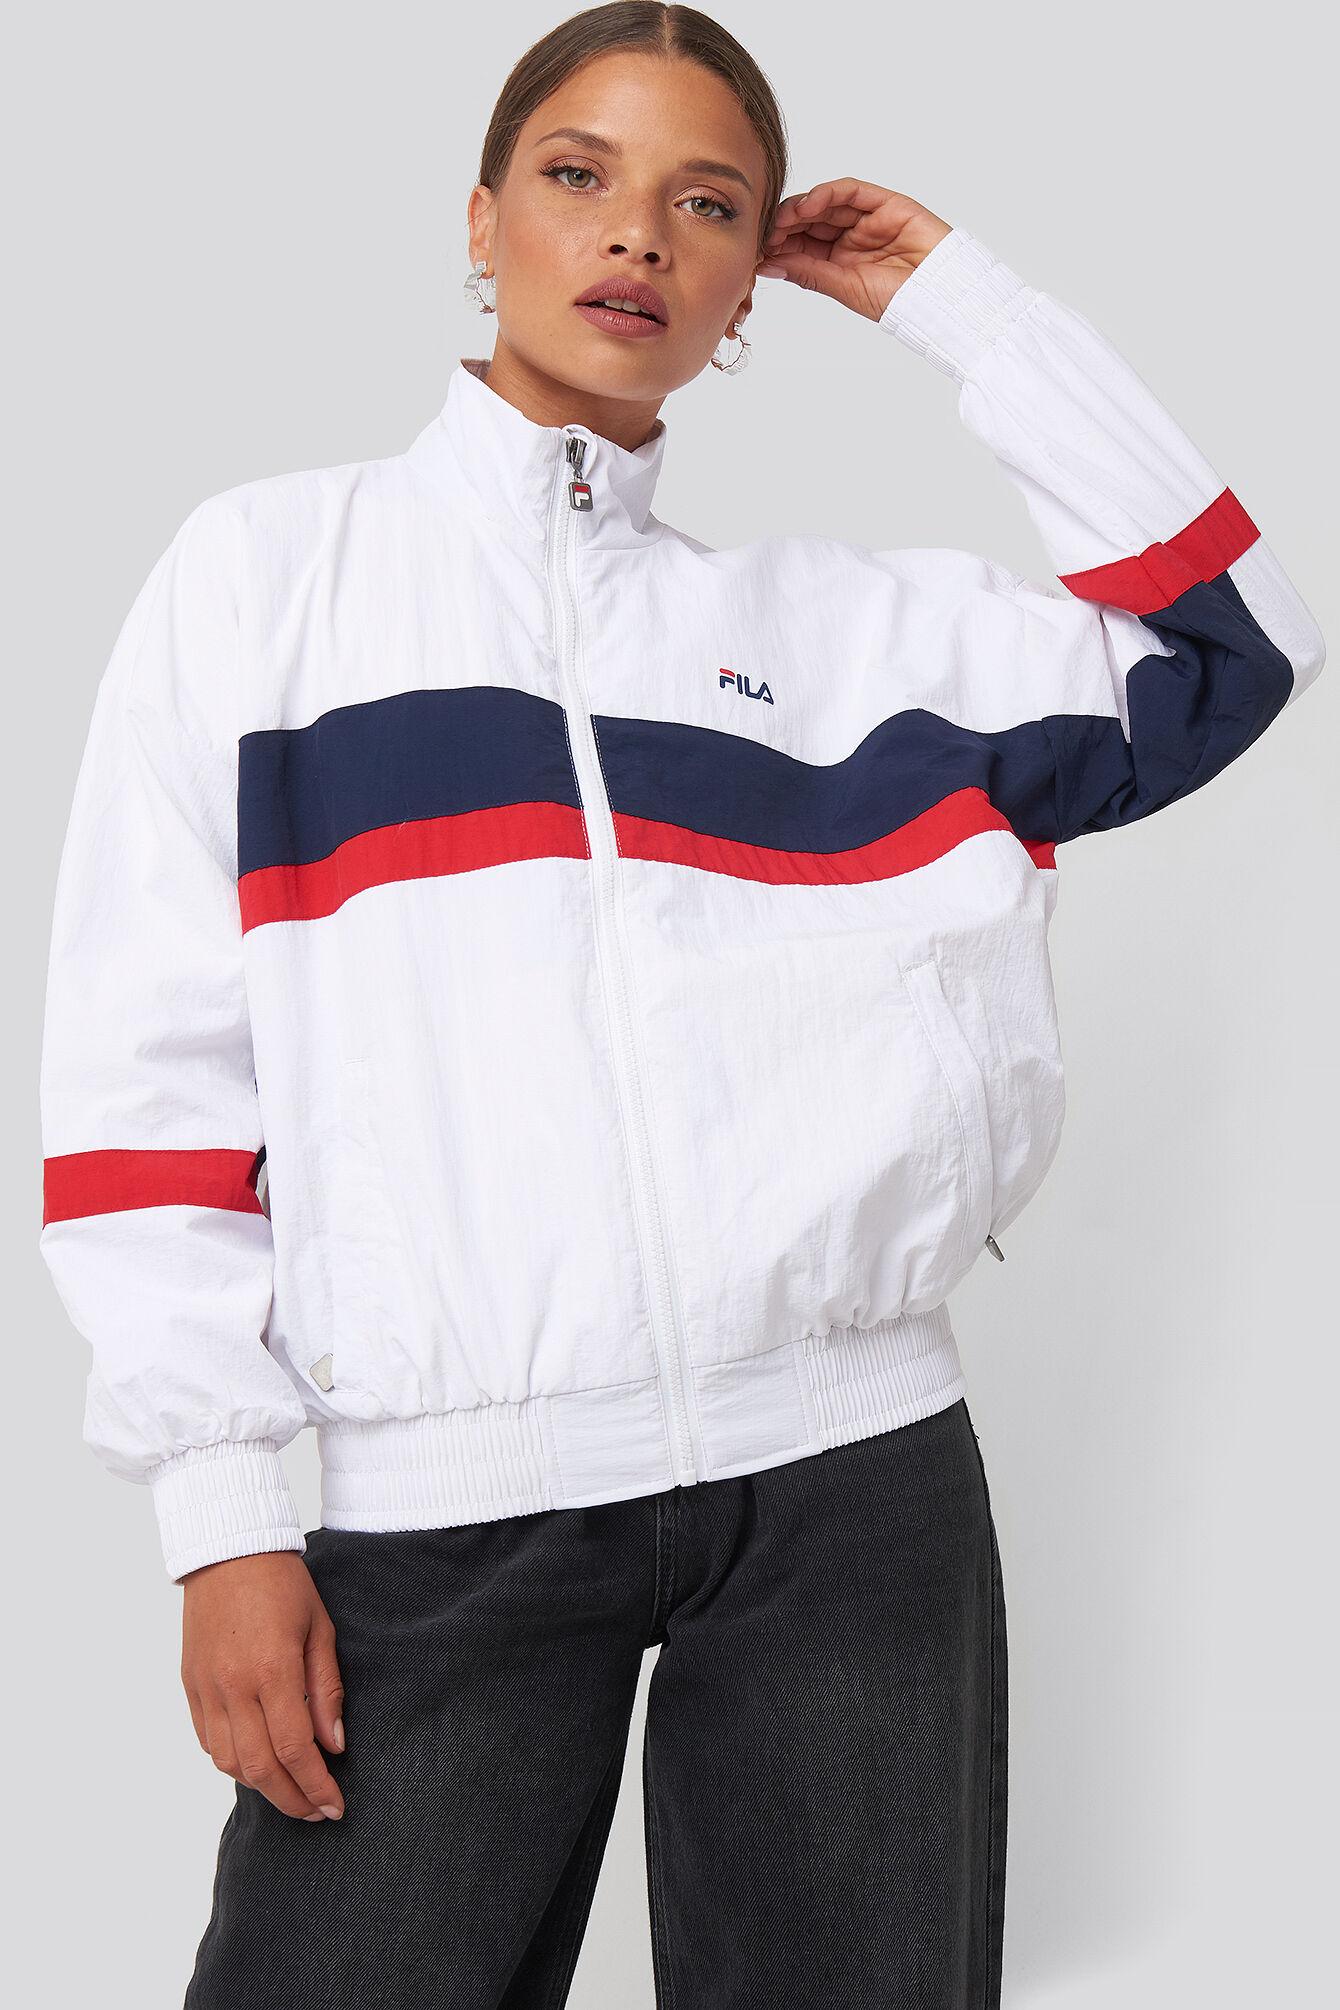 FILA Kaya Wind Jacket - White,Multicolor